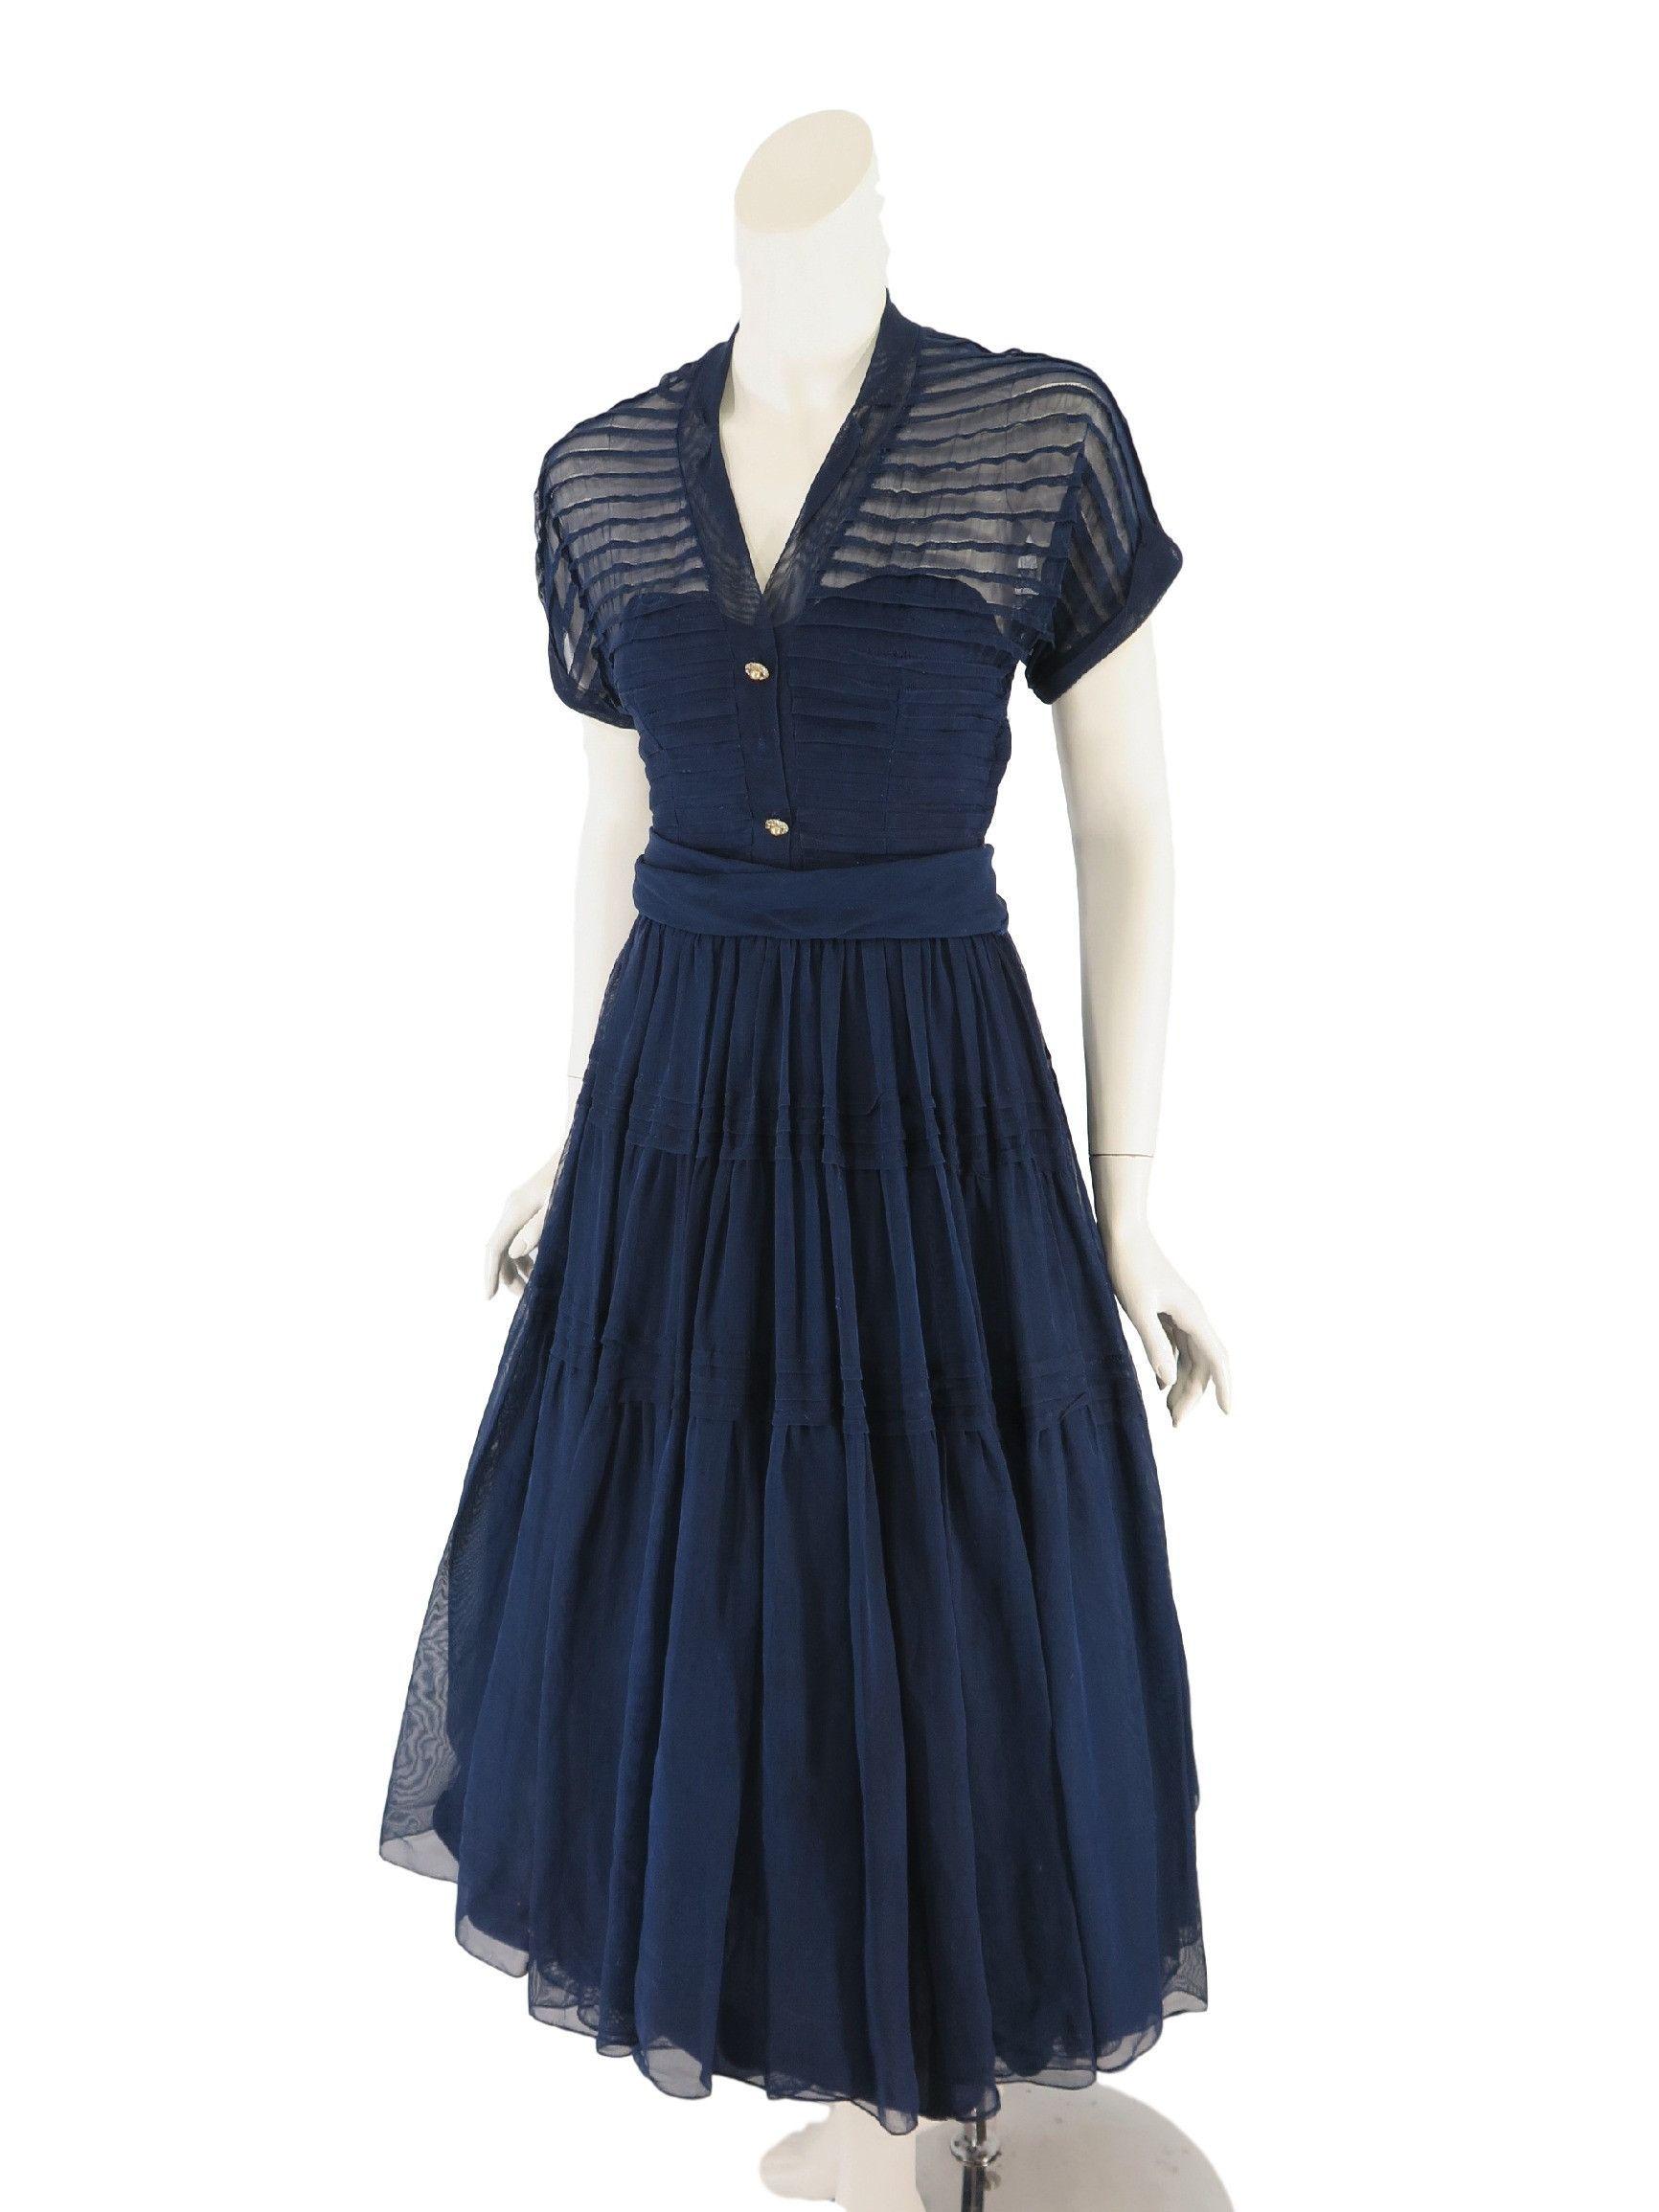 40s/50s Navy Blue Party Dress - sm #navyblueshortdress